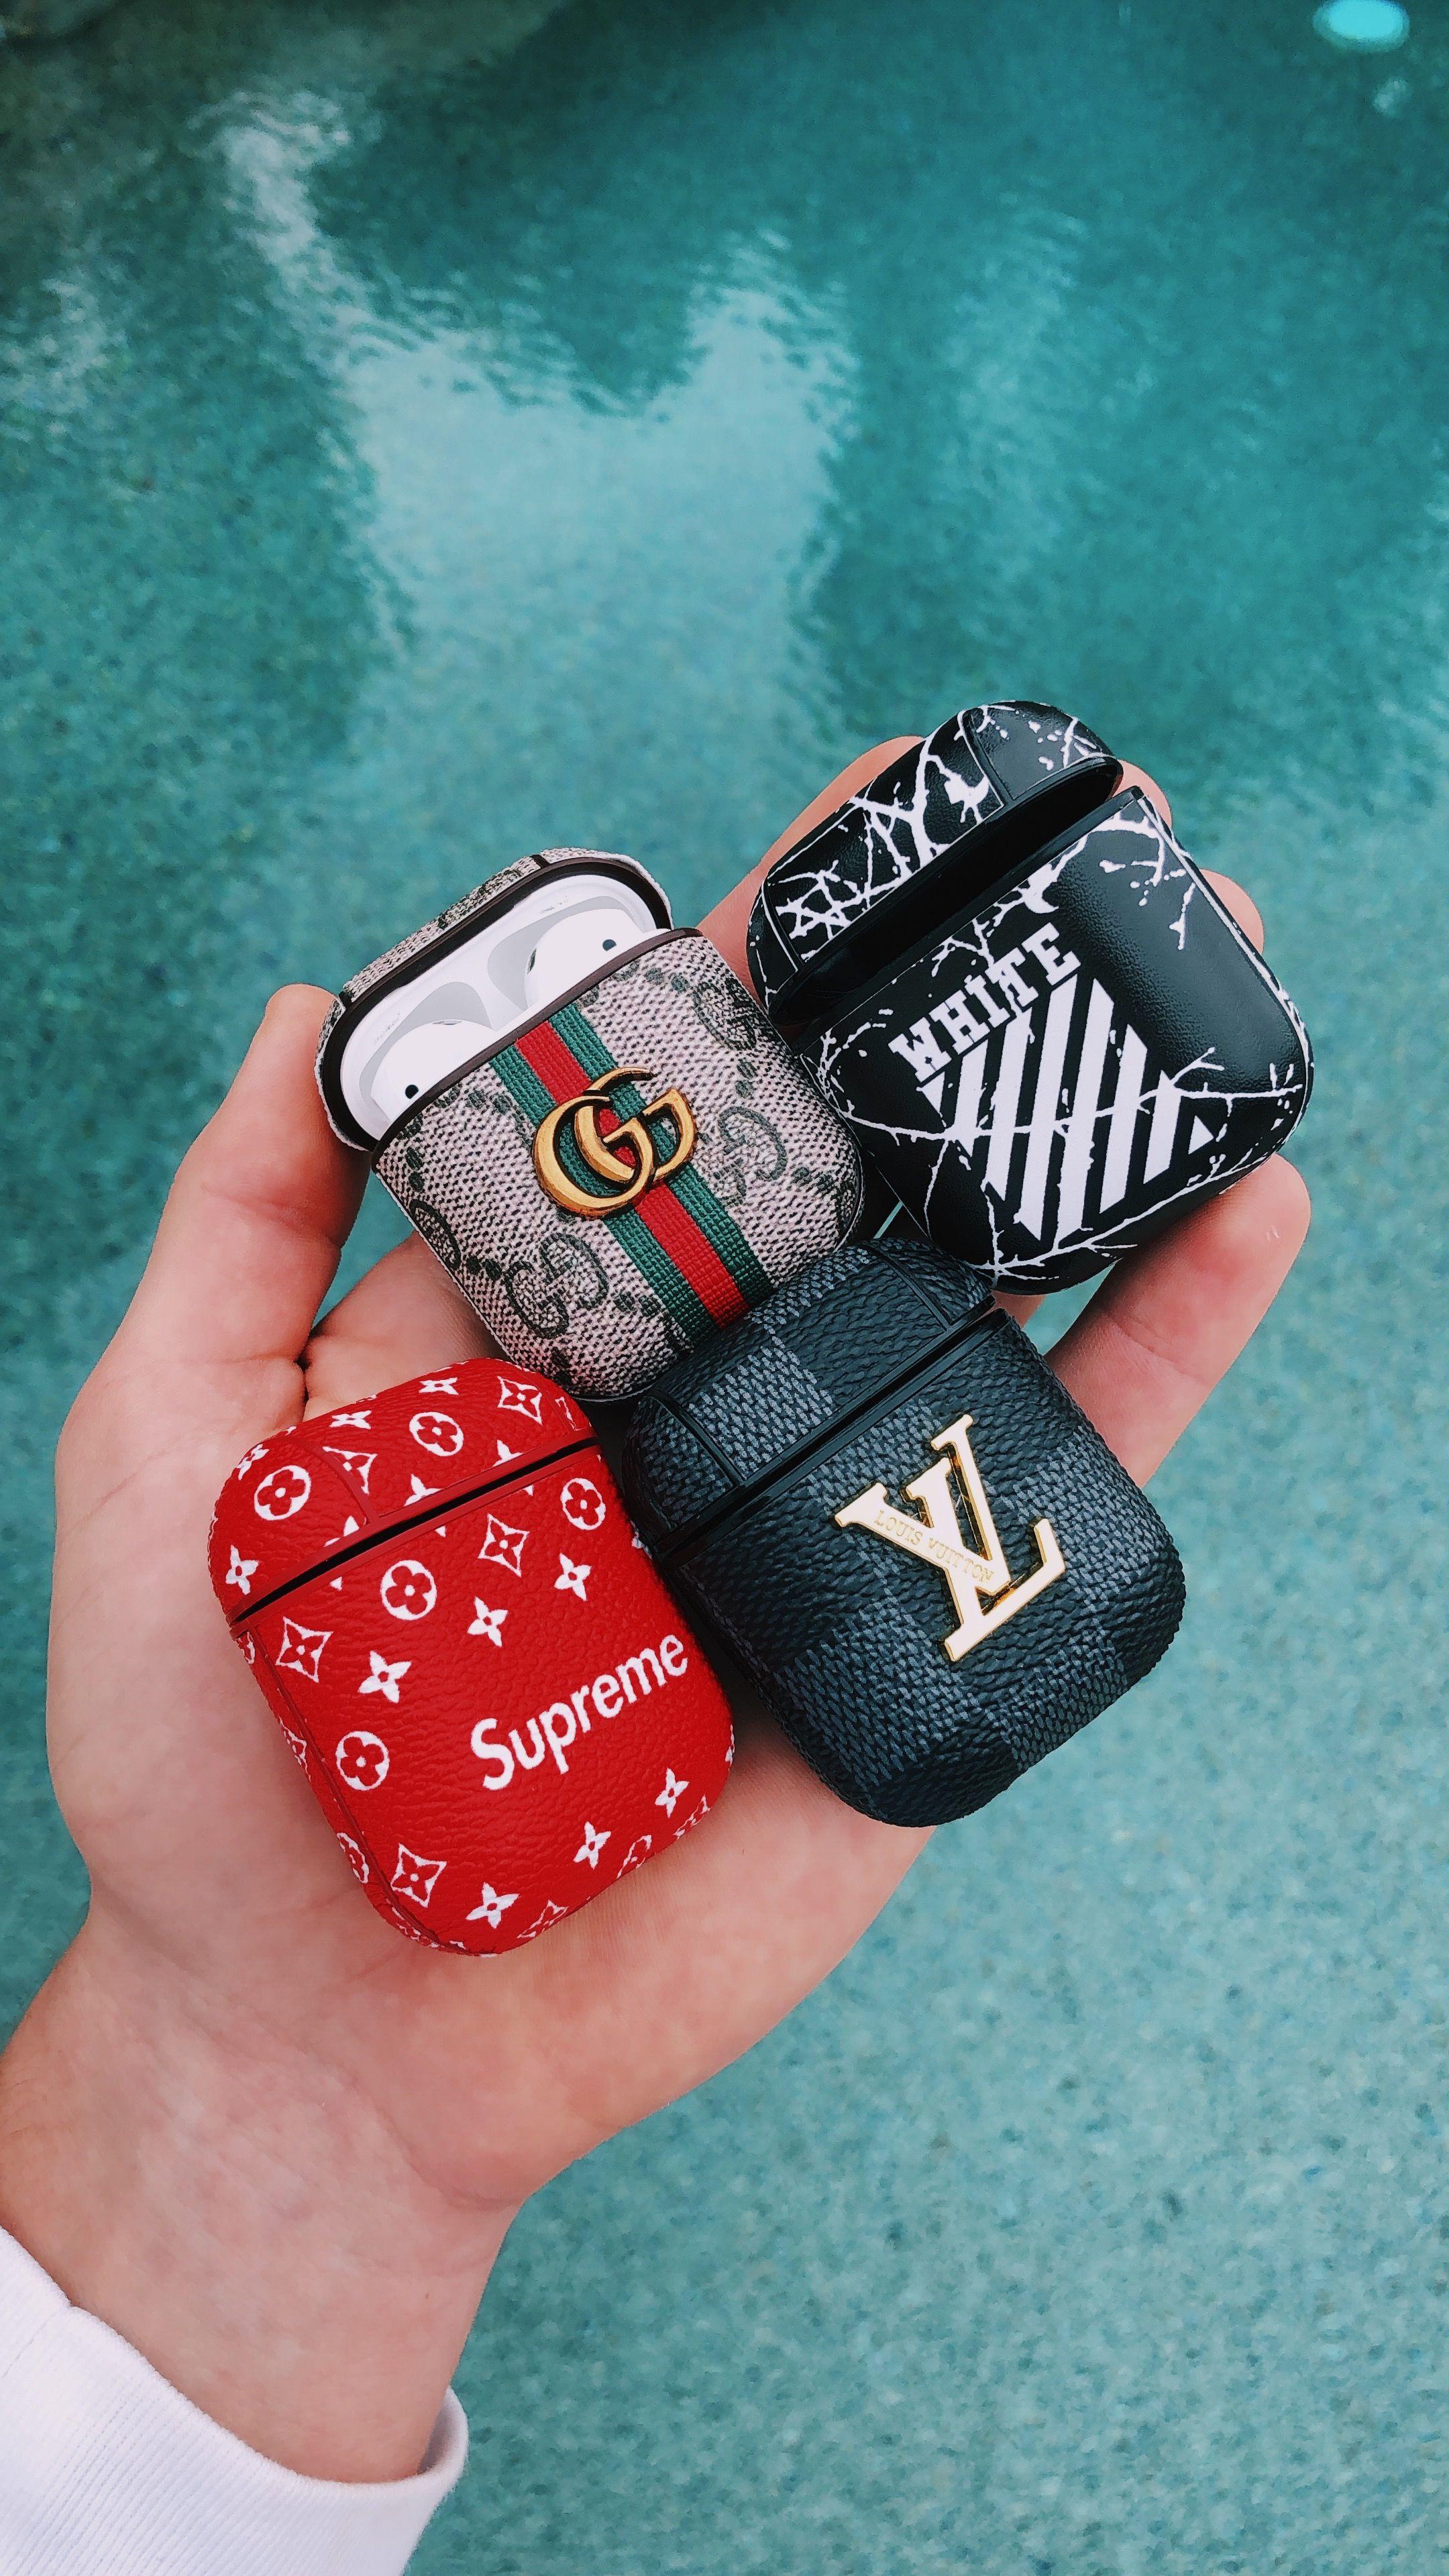 Designer Airpods Case Earbuds Case Phone Case Accessories Airpod Case